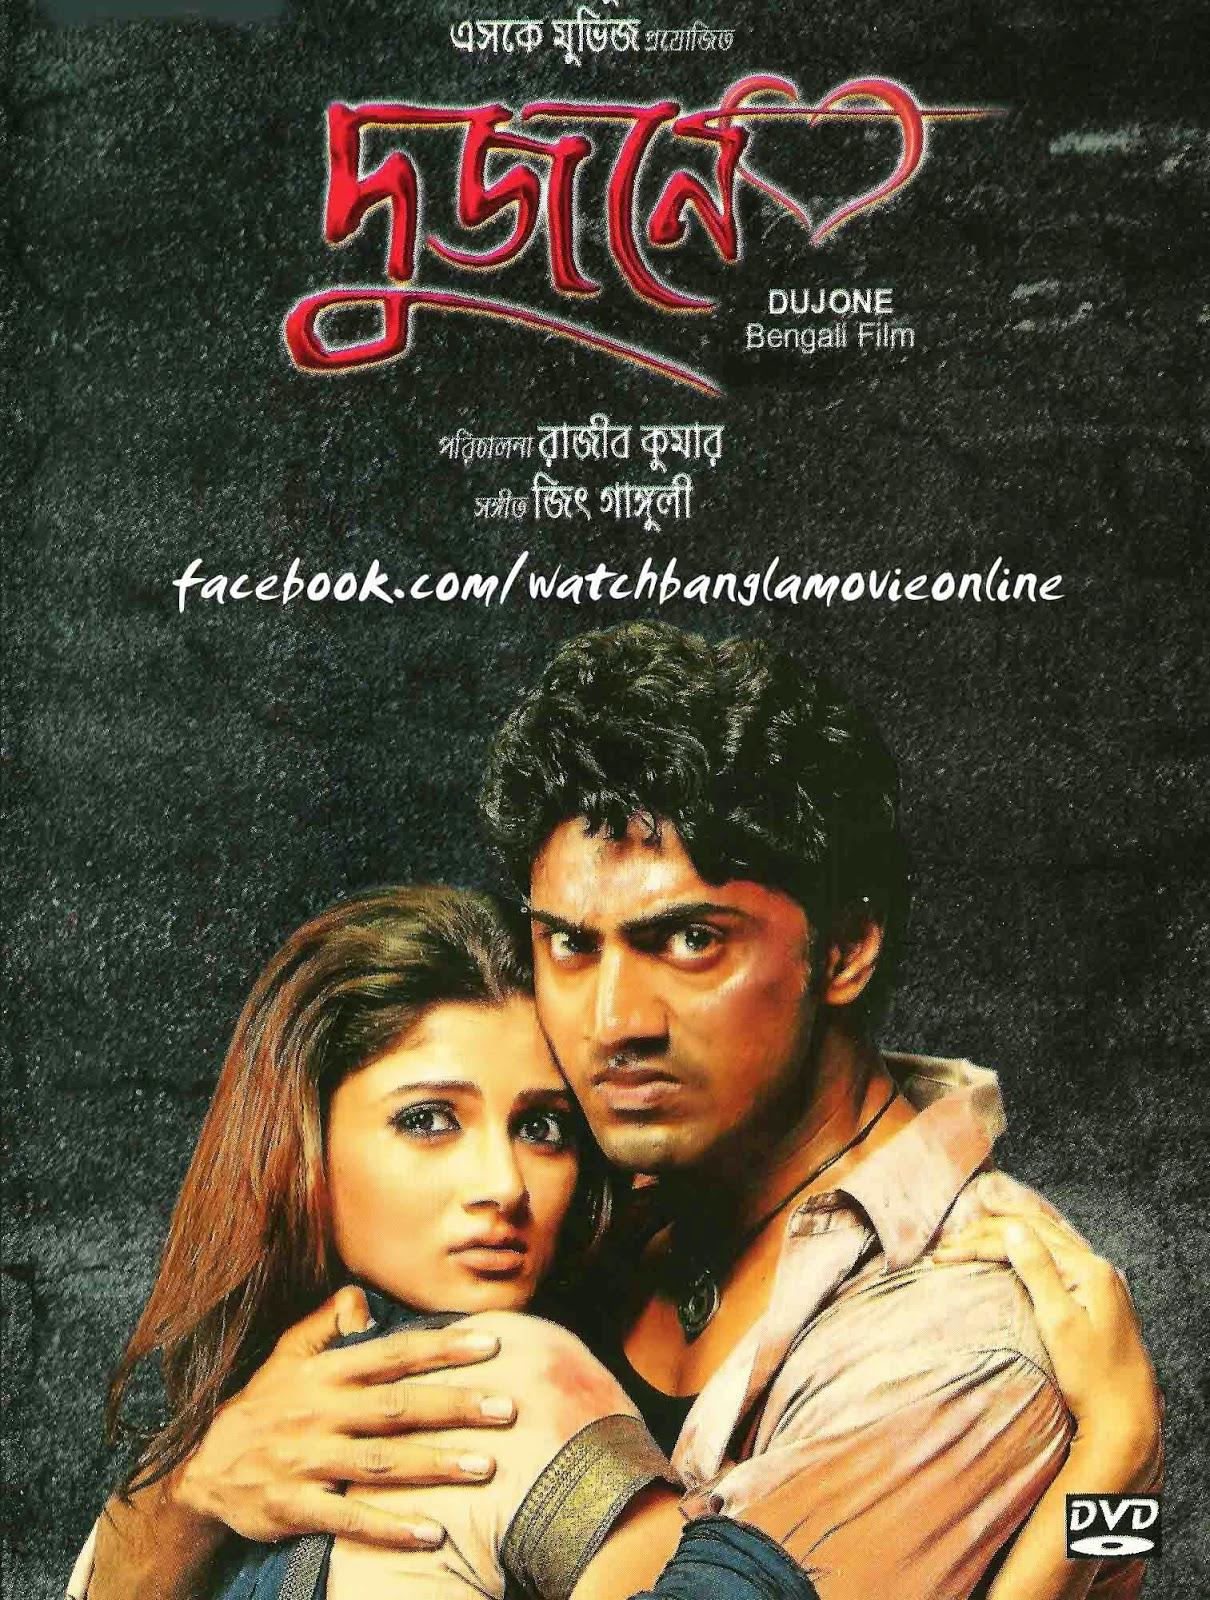 Dujone Old Bengali Movie Mp3 Songs Free Download Dujone film